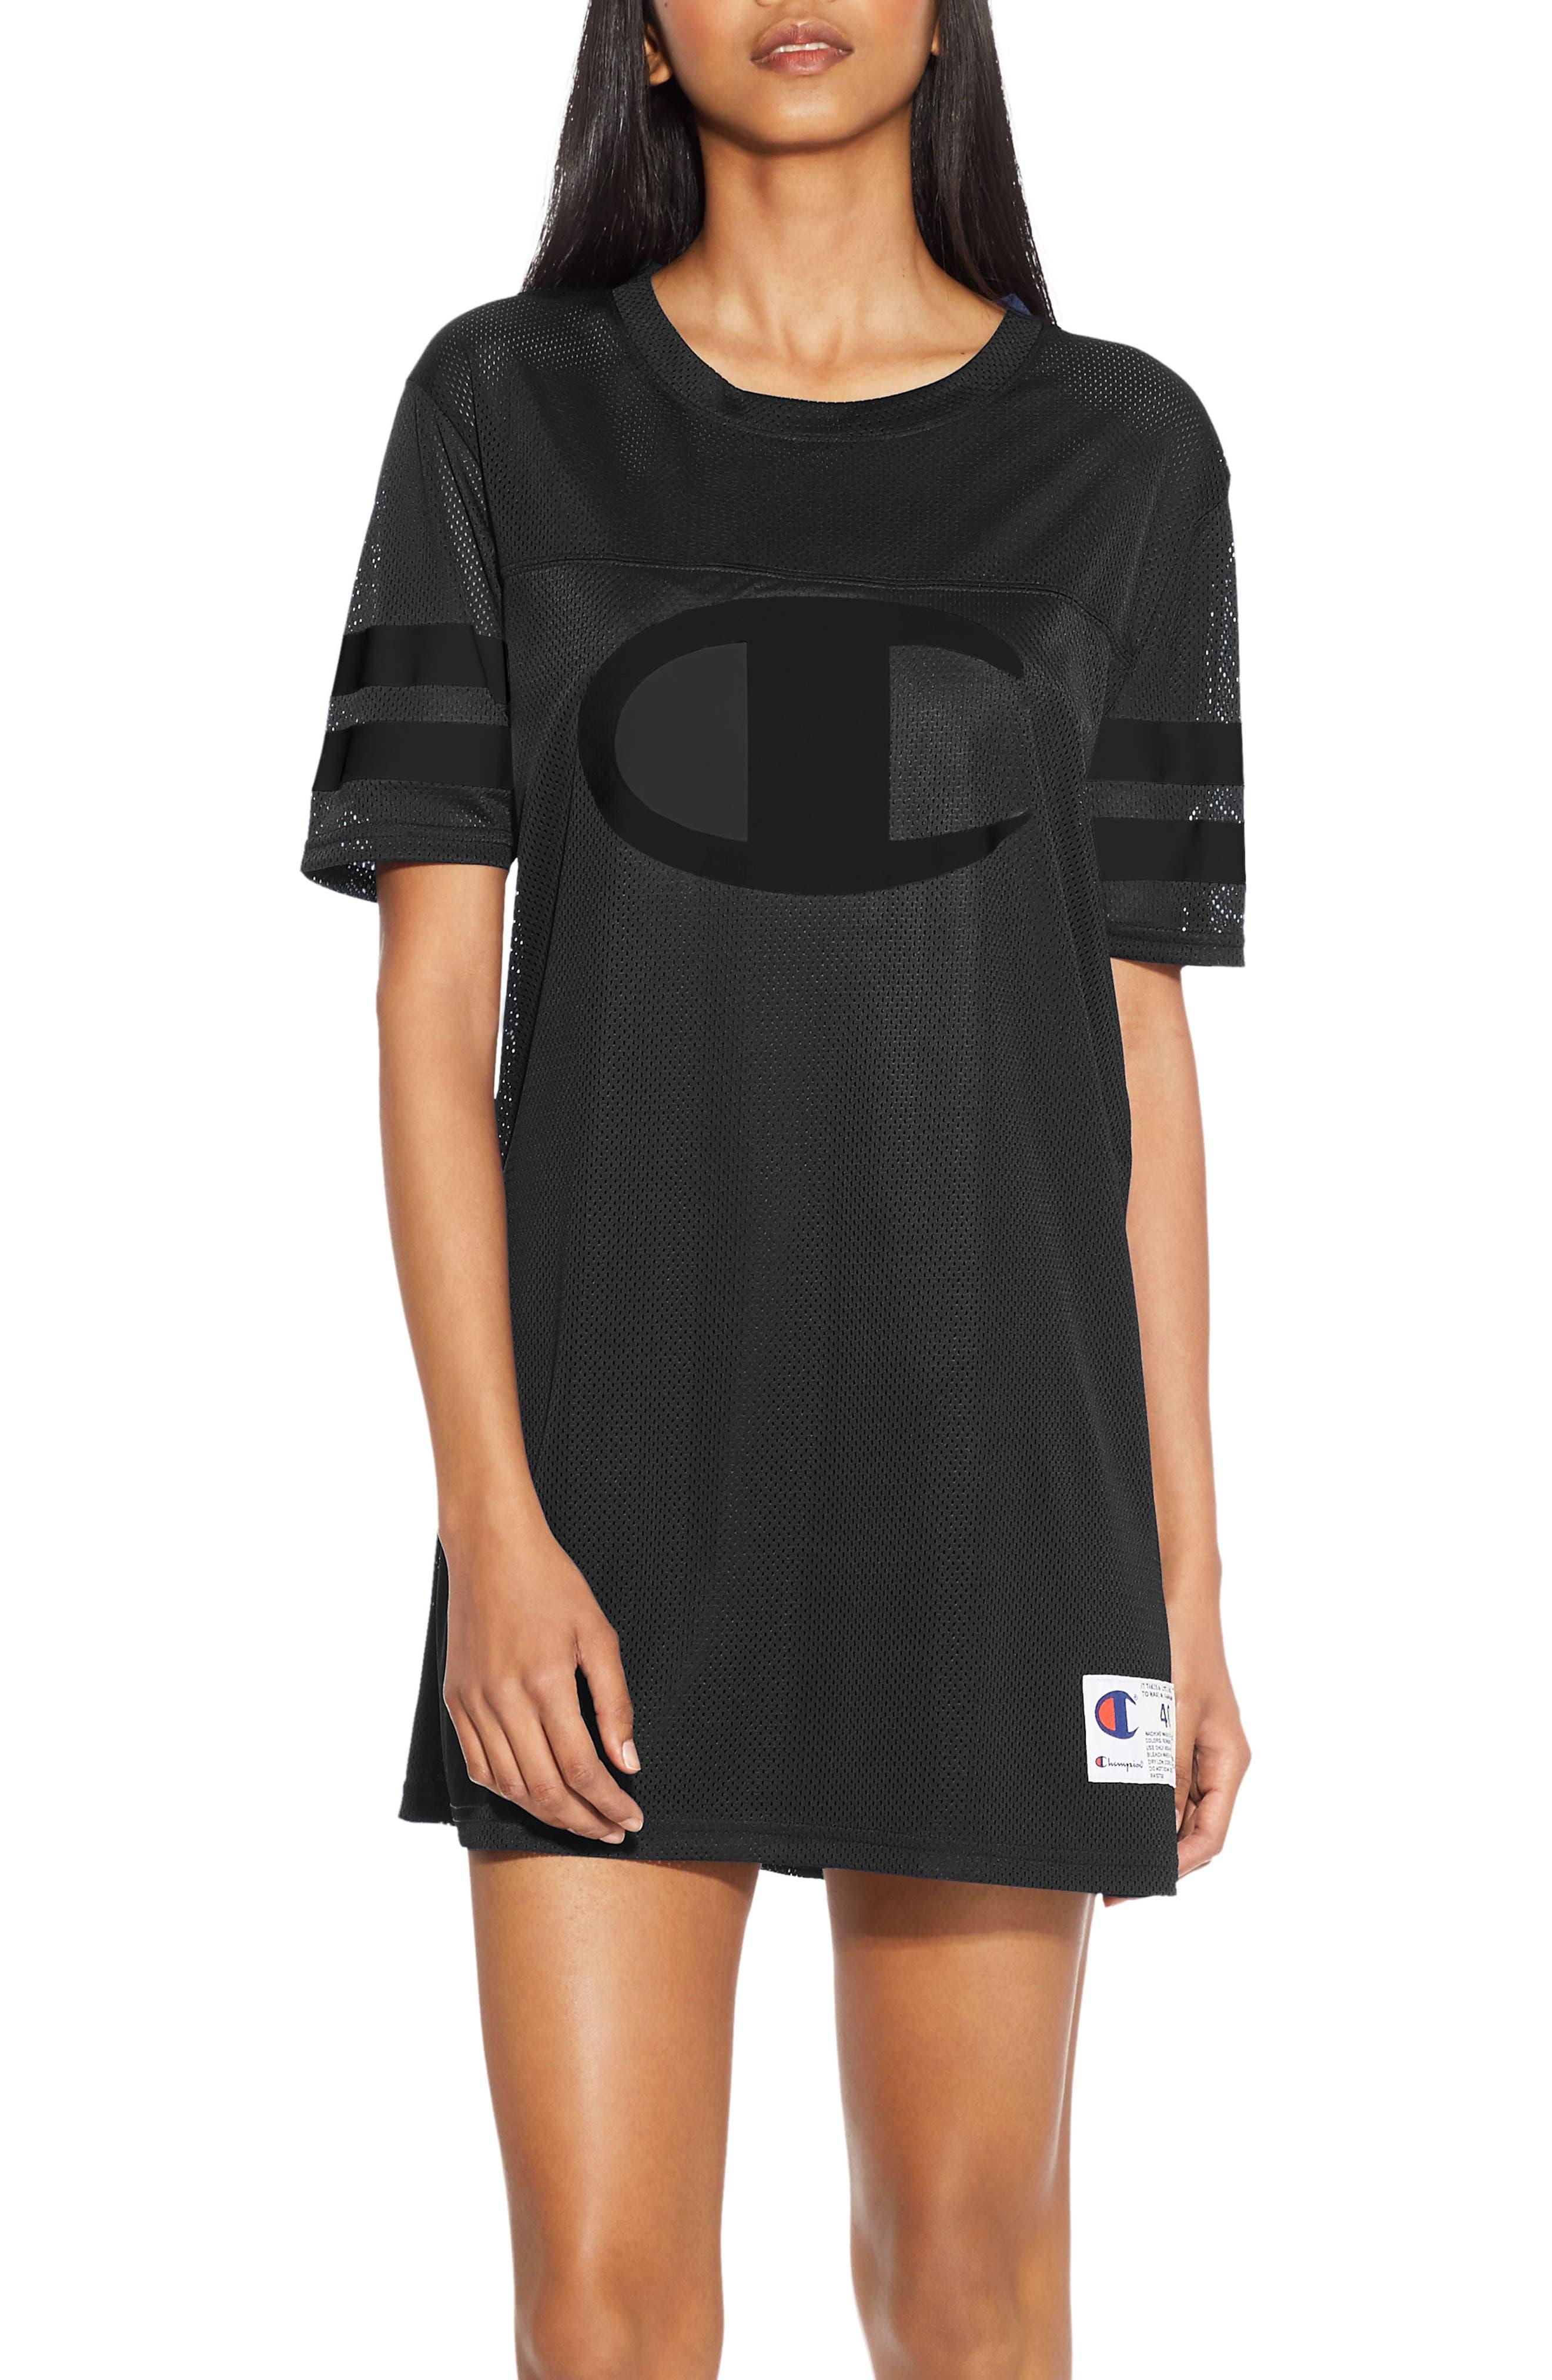 Life<sup>®</sup> Mesh T-Shirt Dress,                             Main thumbnail 1, color,                             Black